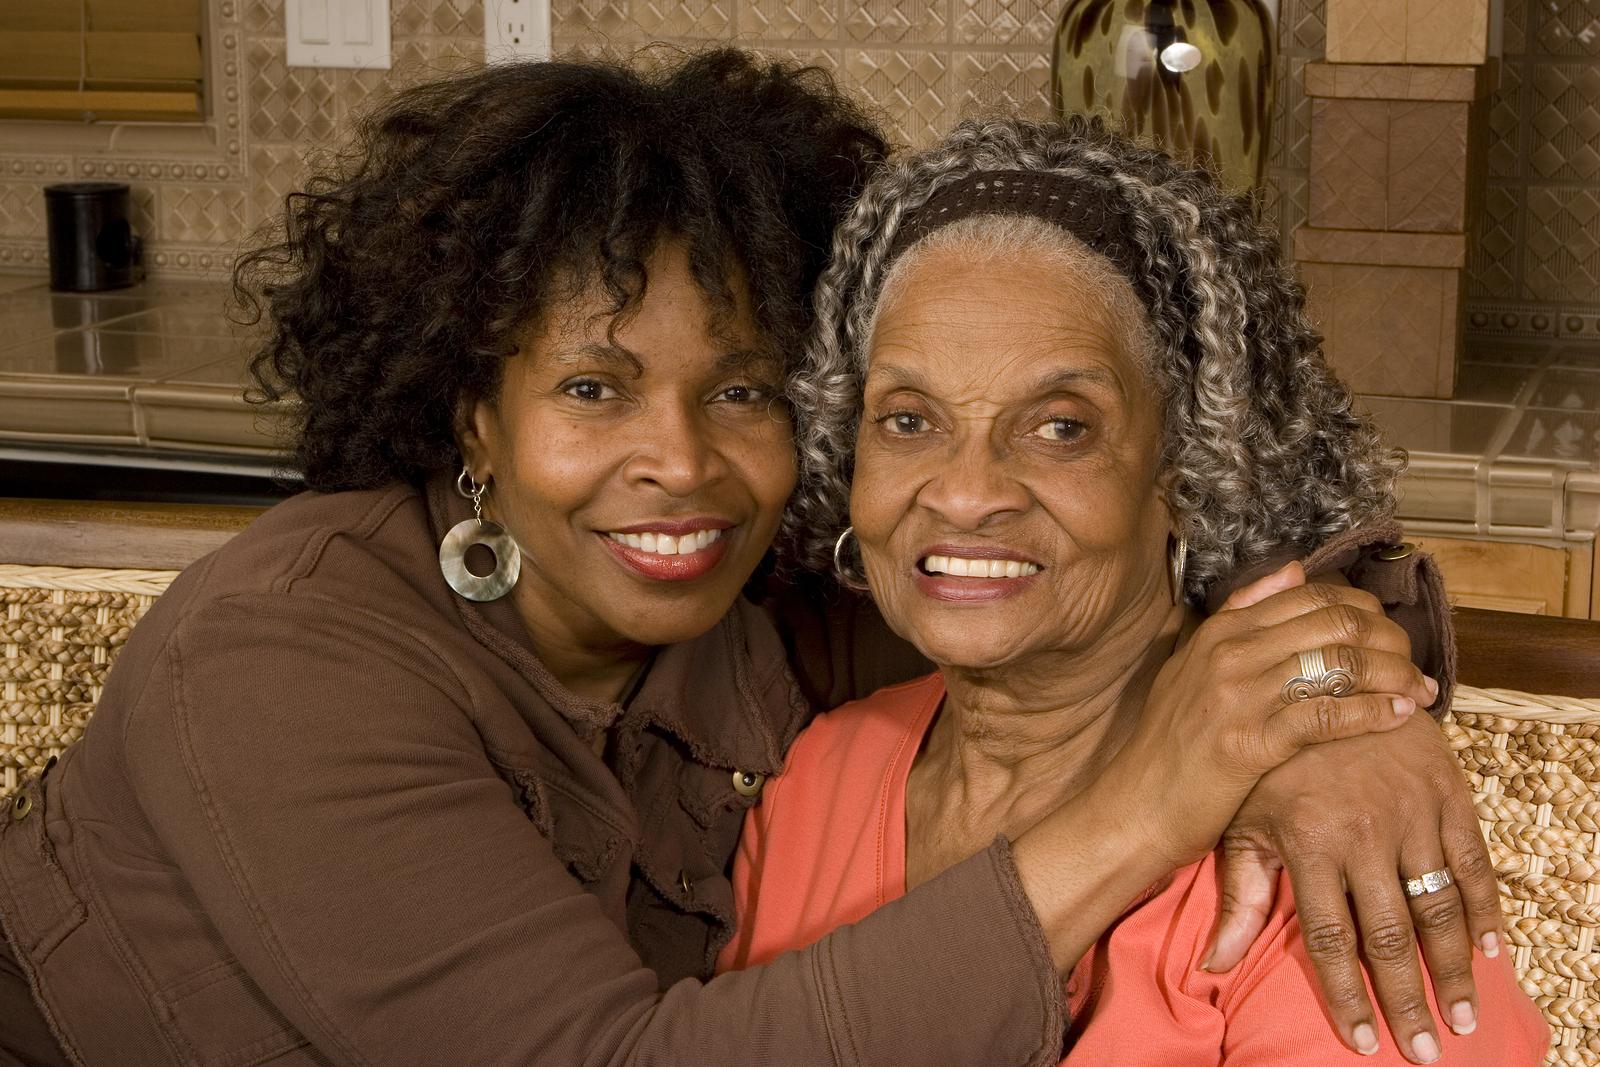 Home Health Care in Atlanta GA: Aging Changes